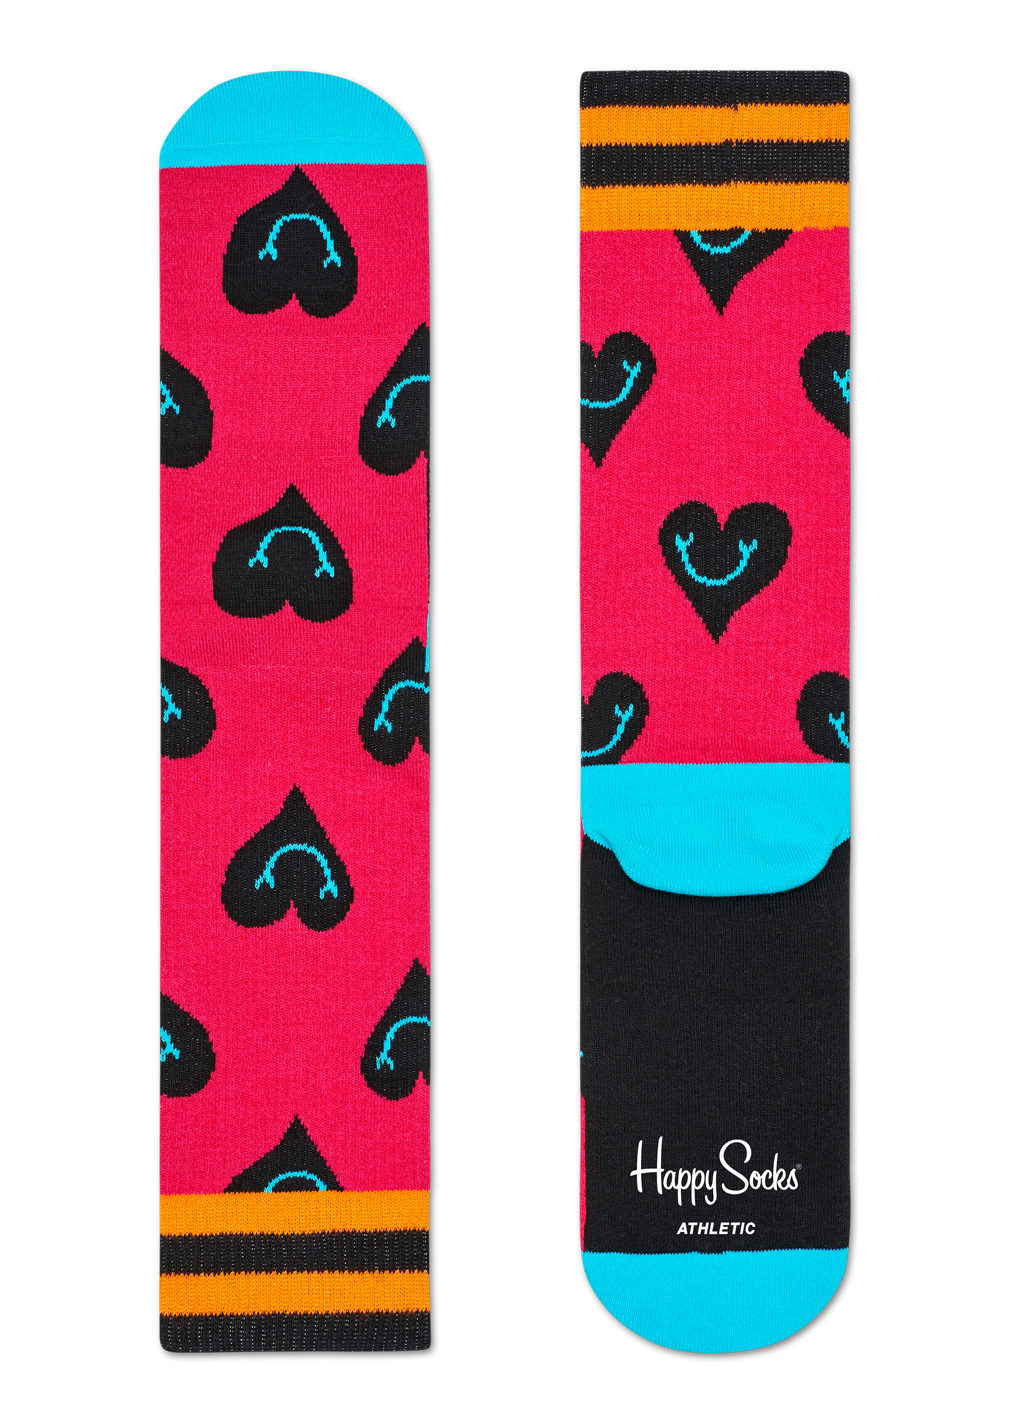 Athletic Smiley Heart Sock